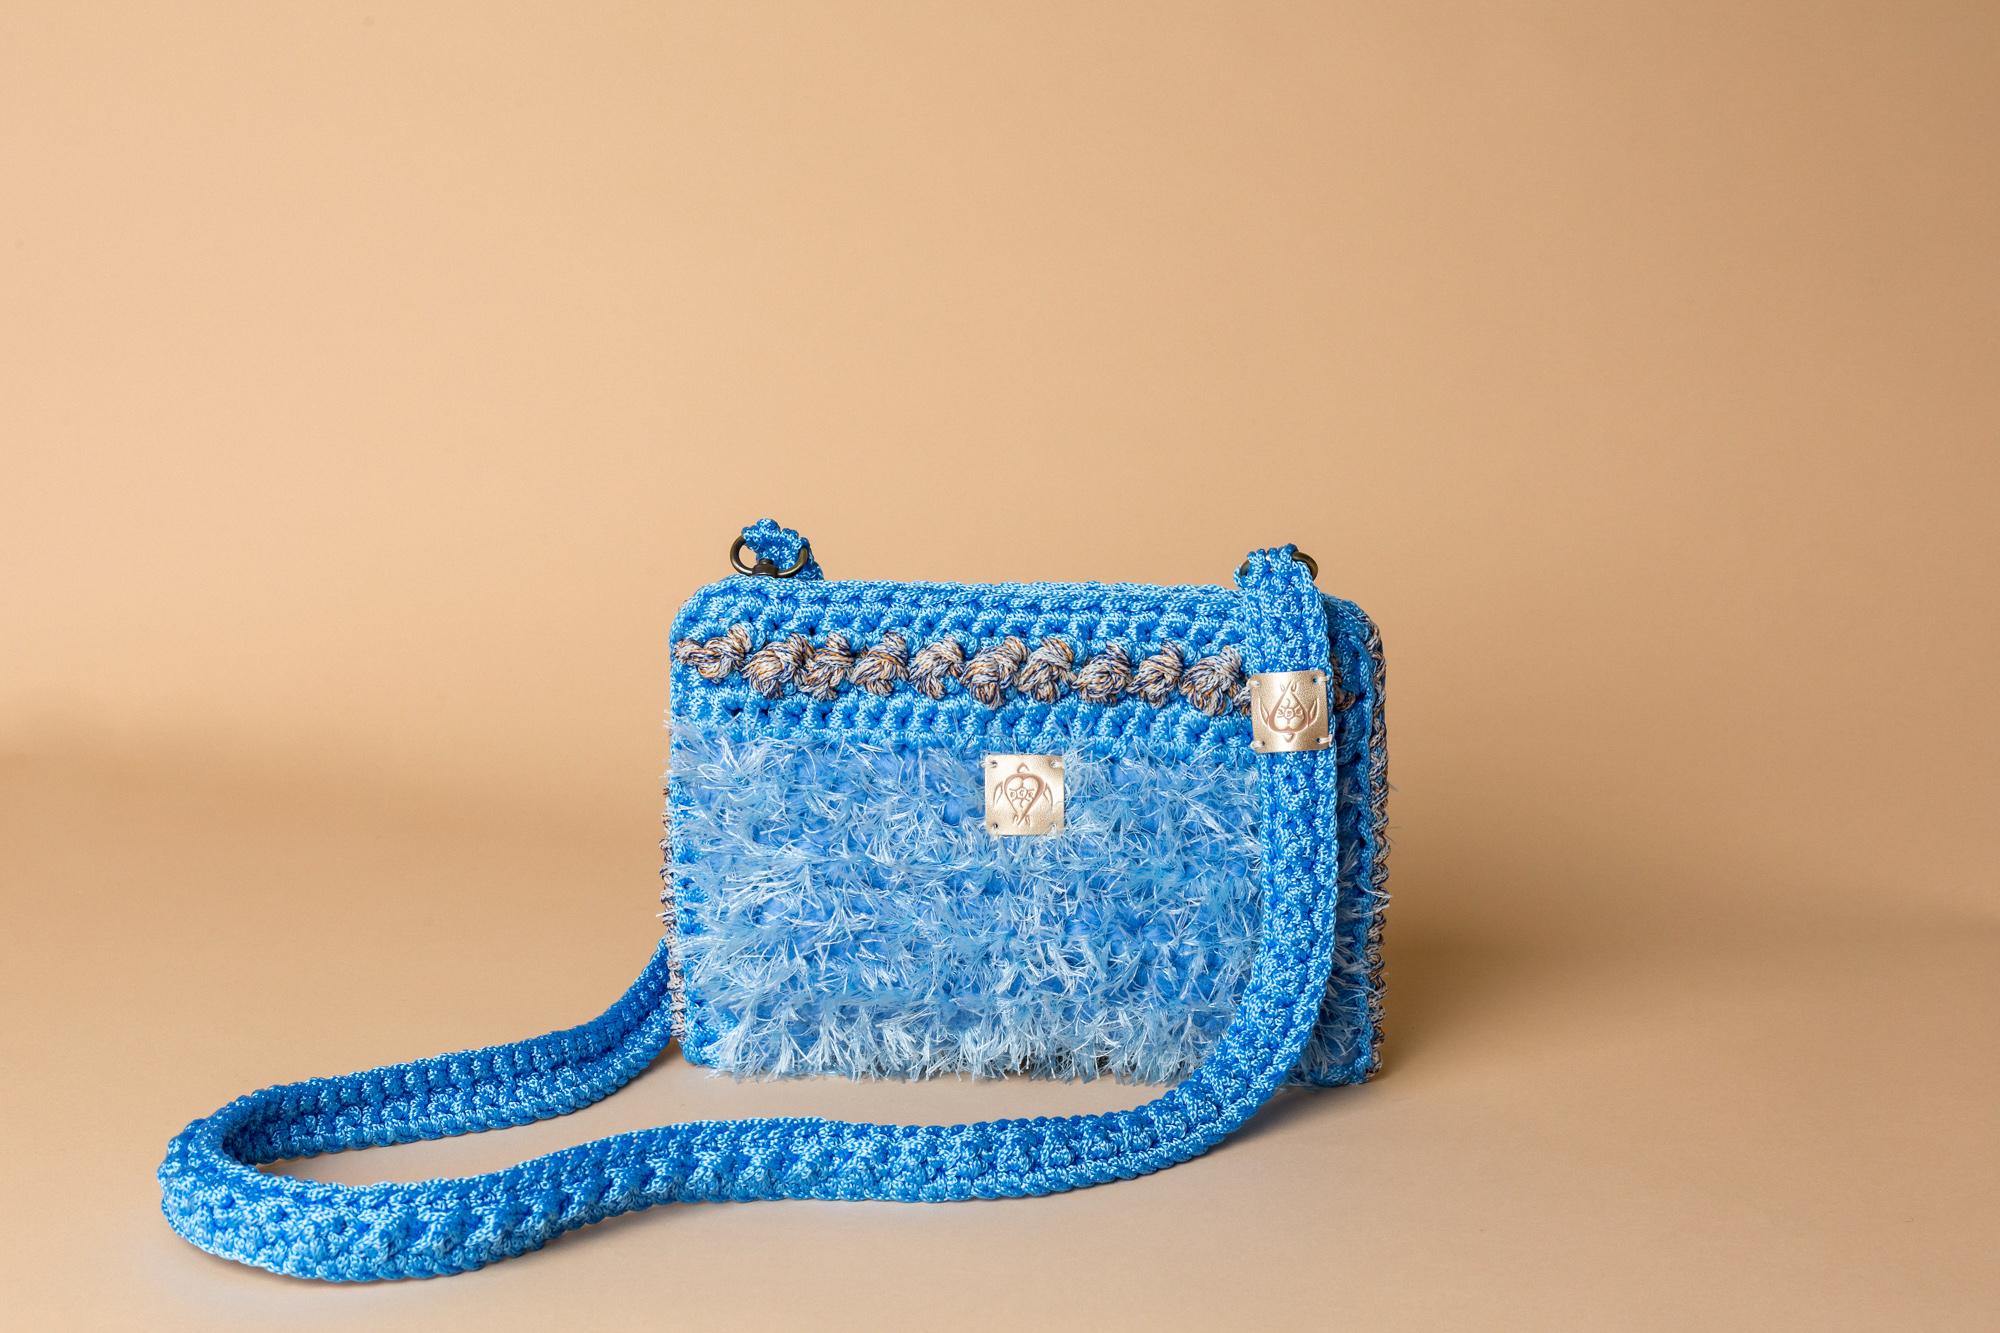 crochet bag sky blue